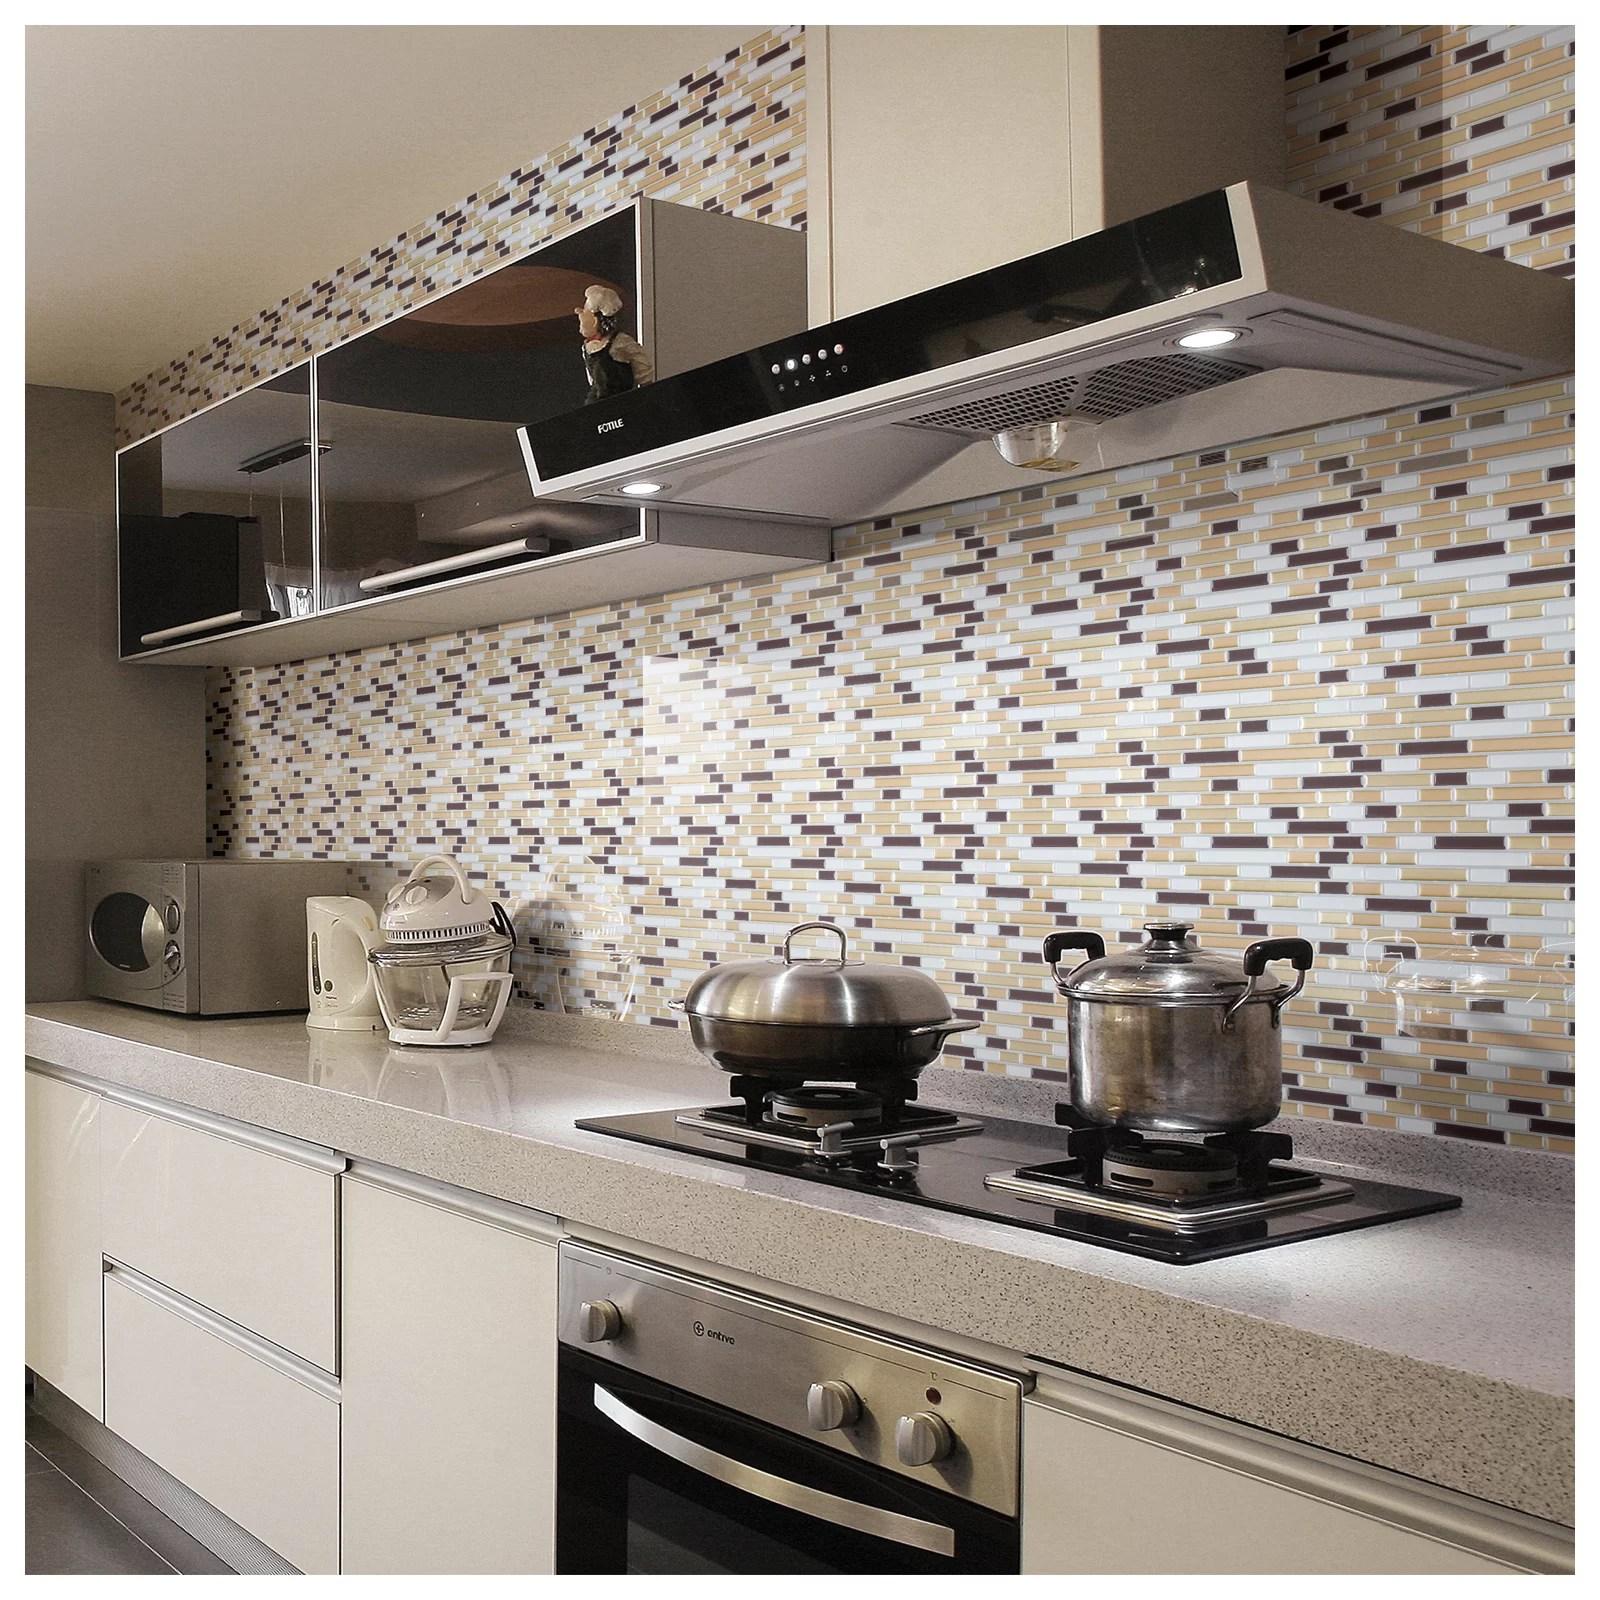 art3d peel and stick backsplash tile sticker vinyl wall covering 12 x 12 champagne gold 10 pack walmart com